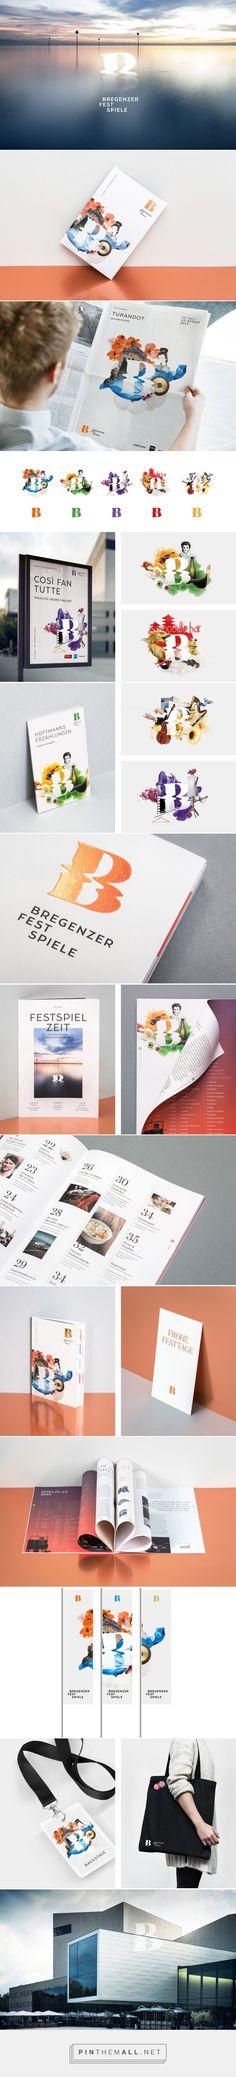 Bregenzer Festpiele – Branding on Behance - created via http://pinthemall.net